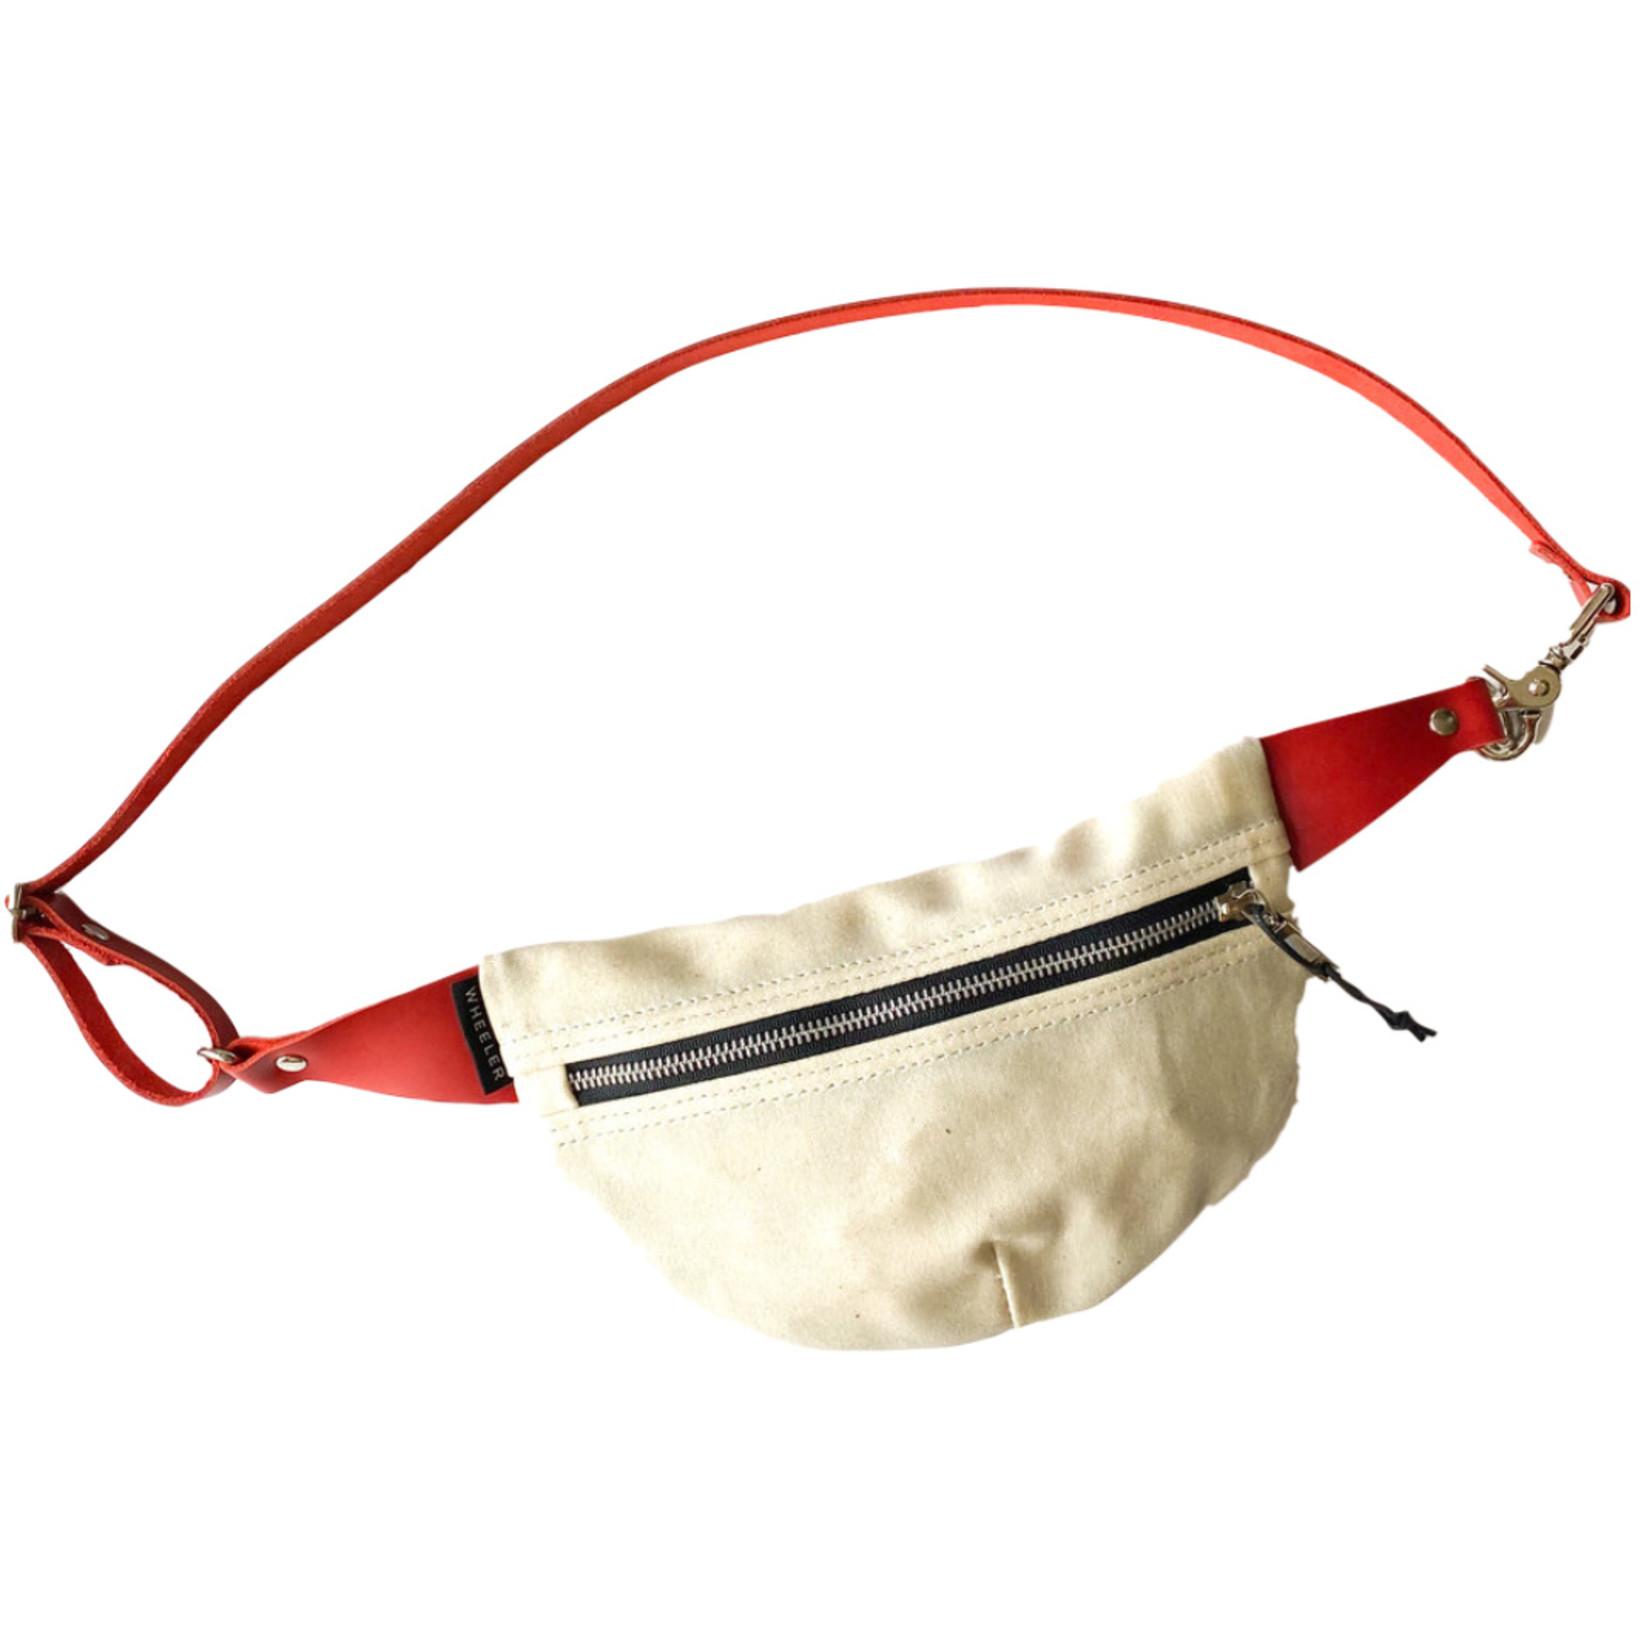 Wheeler Bag Co. Fanny Pack Natural/Red